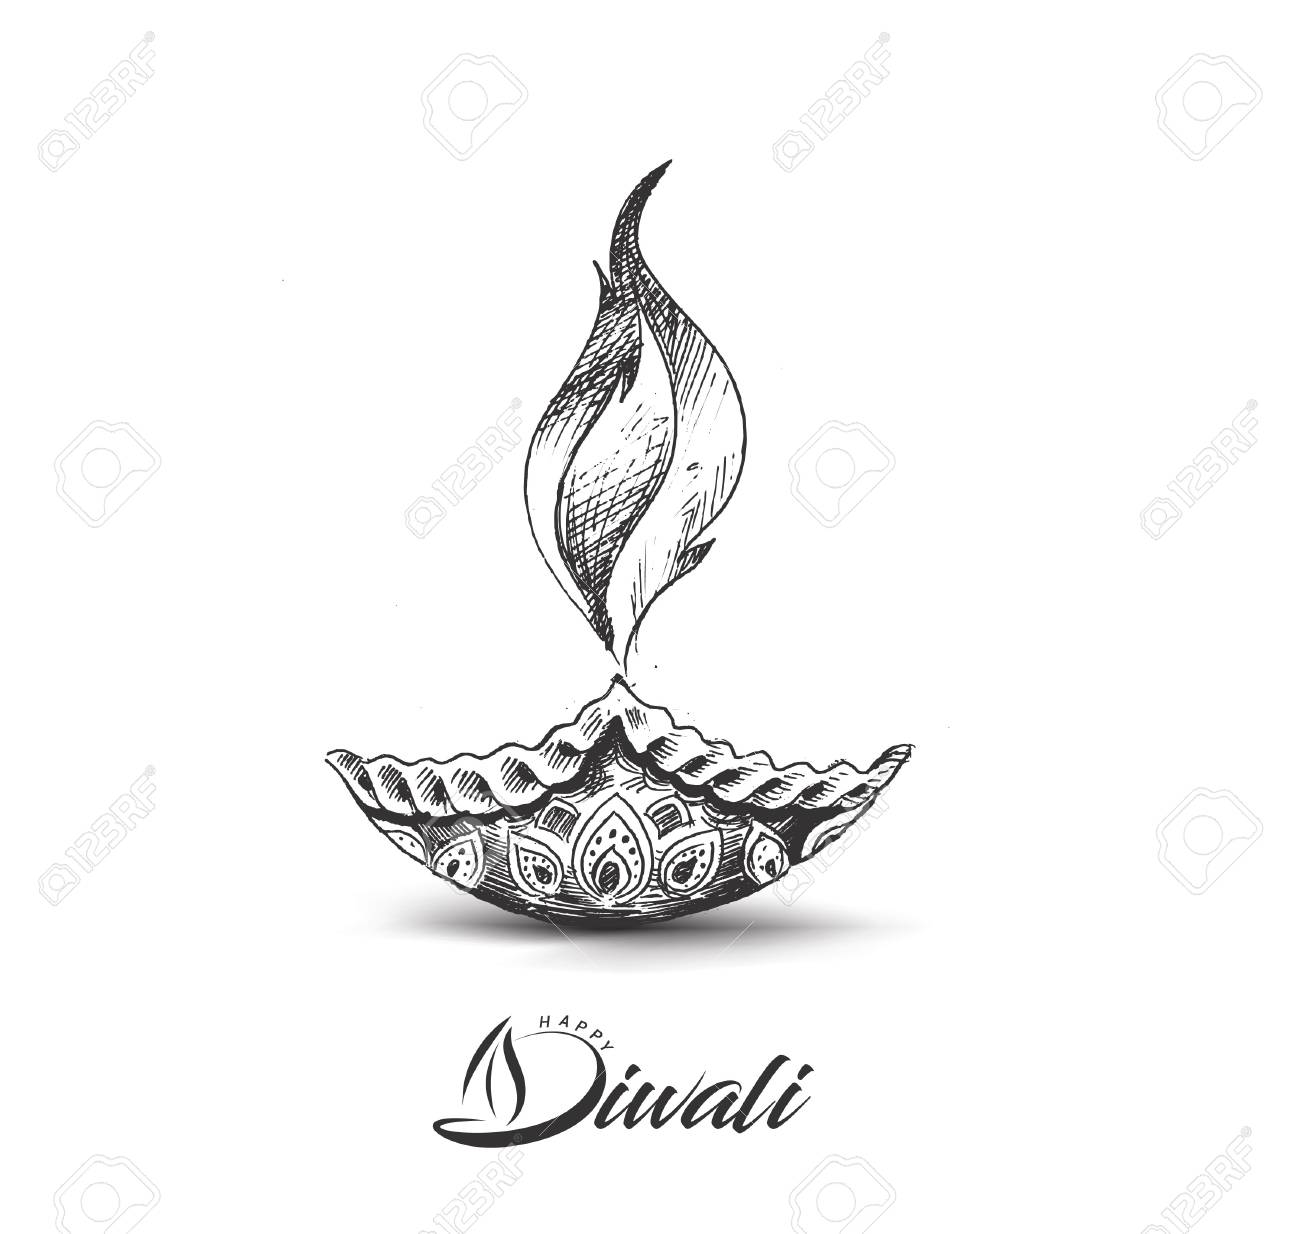 Diwali festival oil lamp diya hand drawn sketch vector